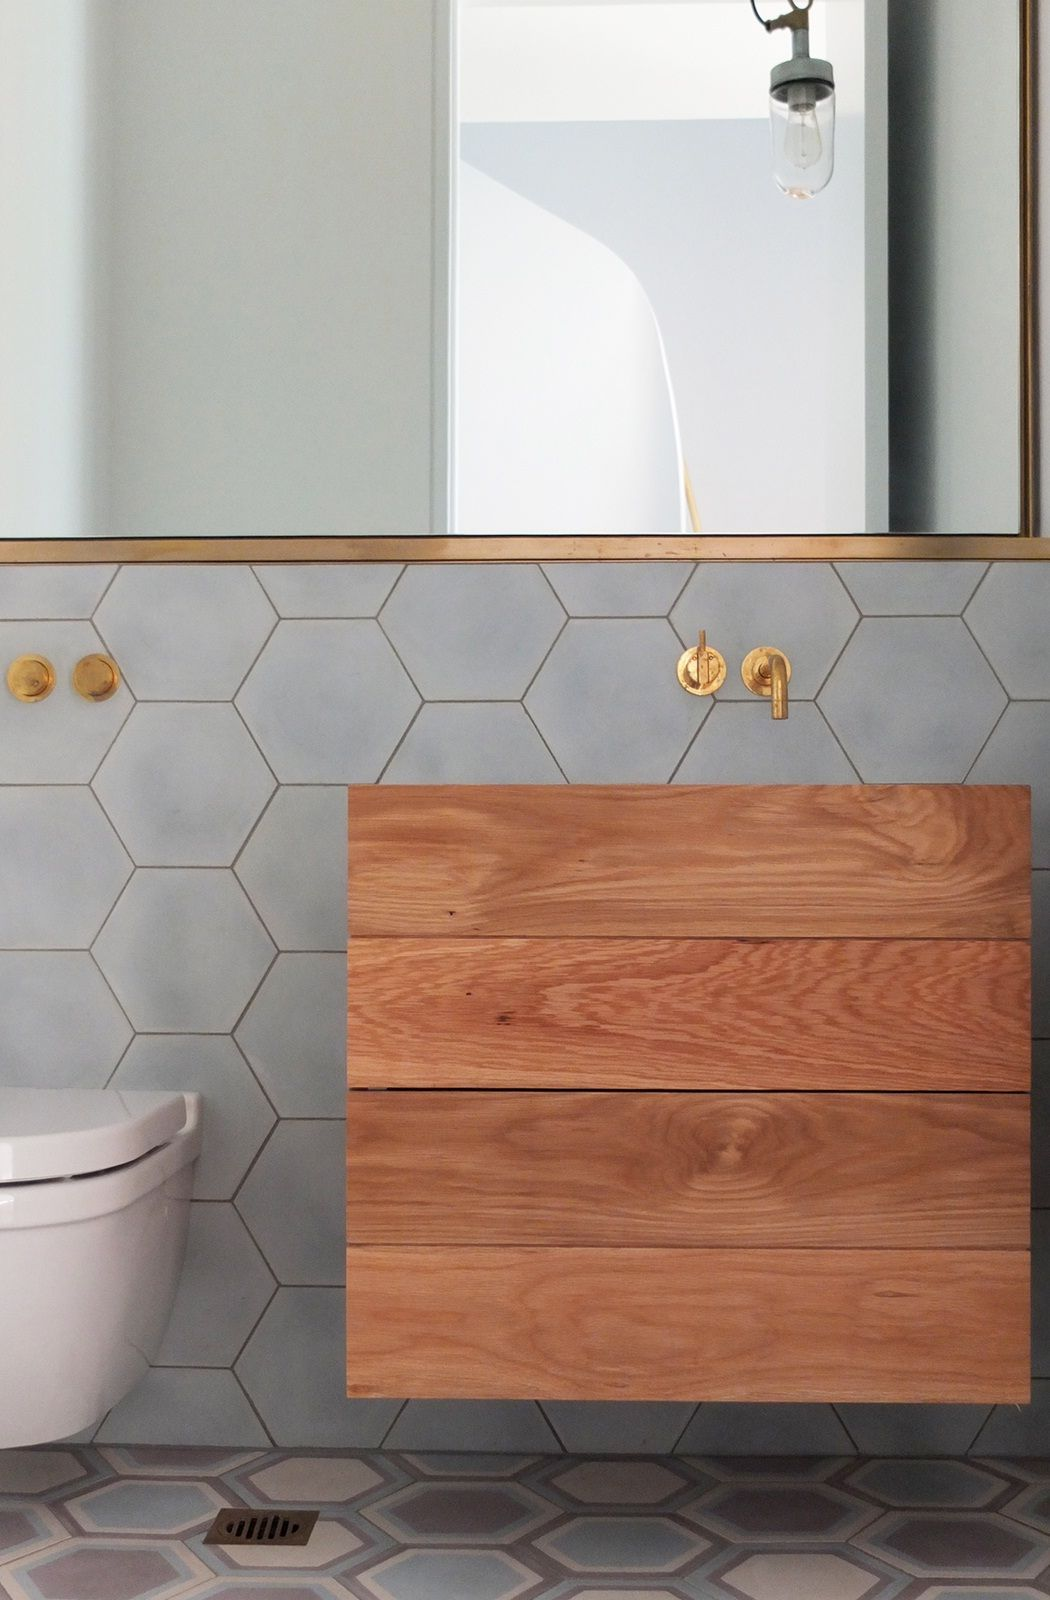 Modern vanity wall mounted hexagon tile bathroom ideas hexagon tile bathroom ideas kitchen design doublecrazyfo Gallery